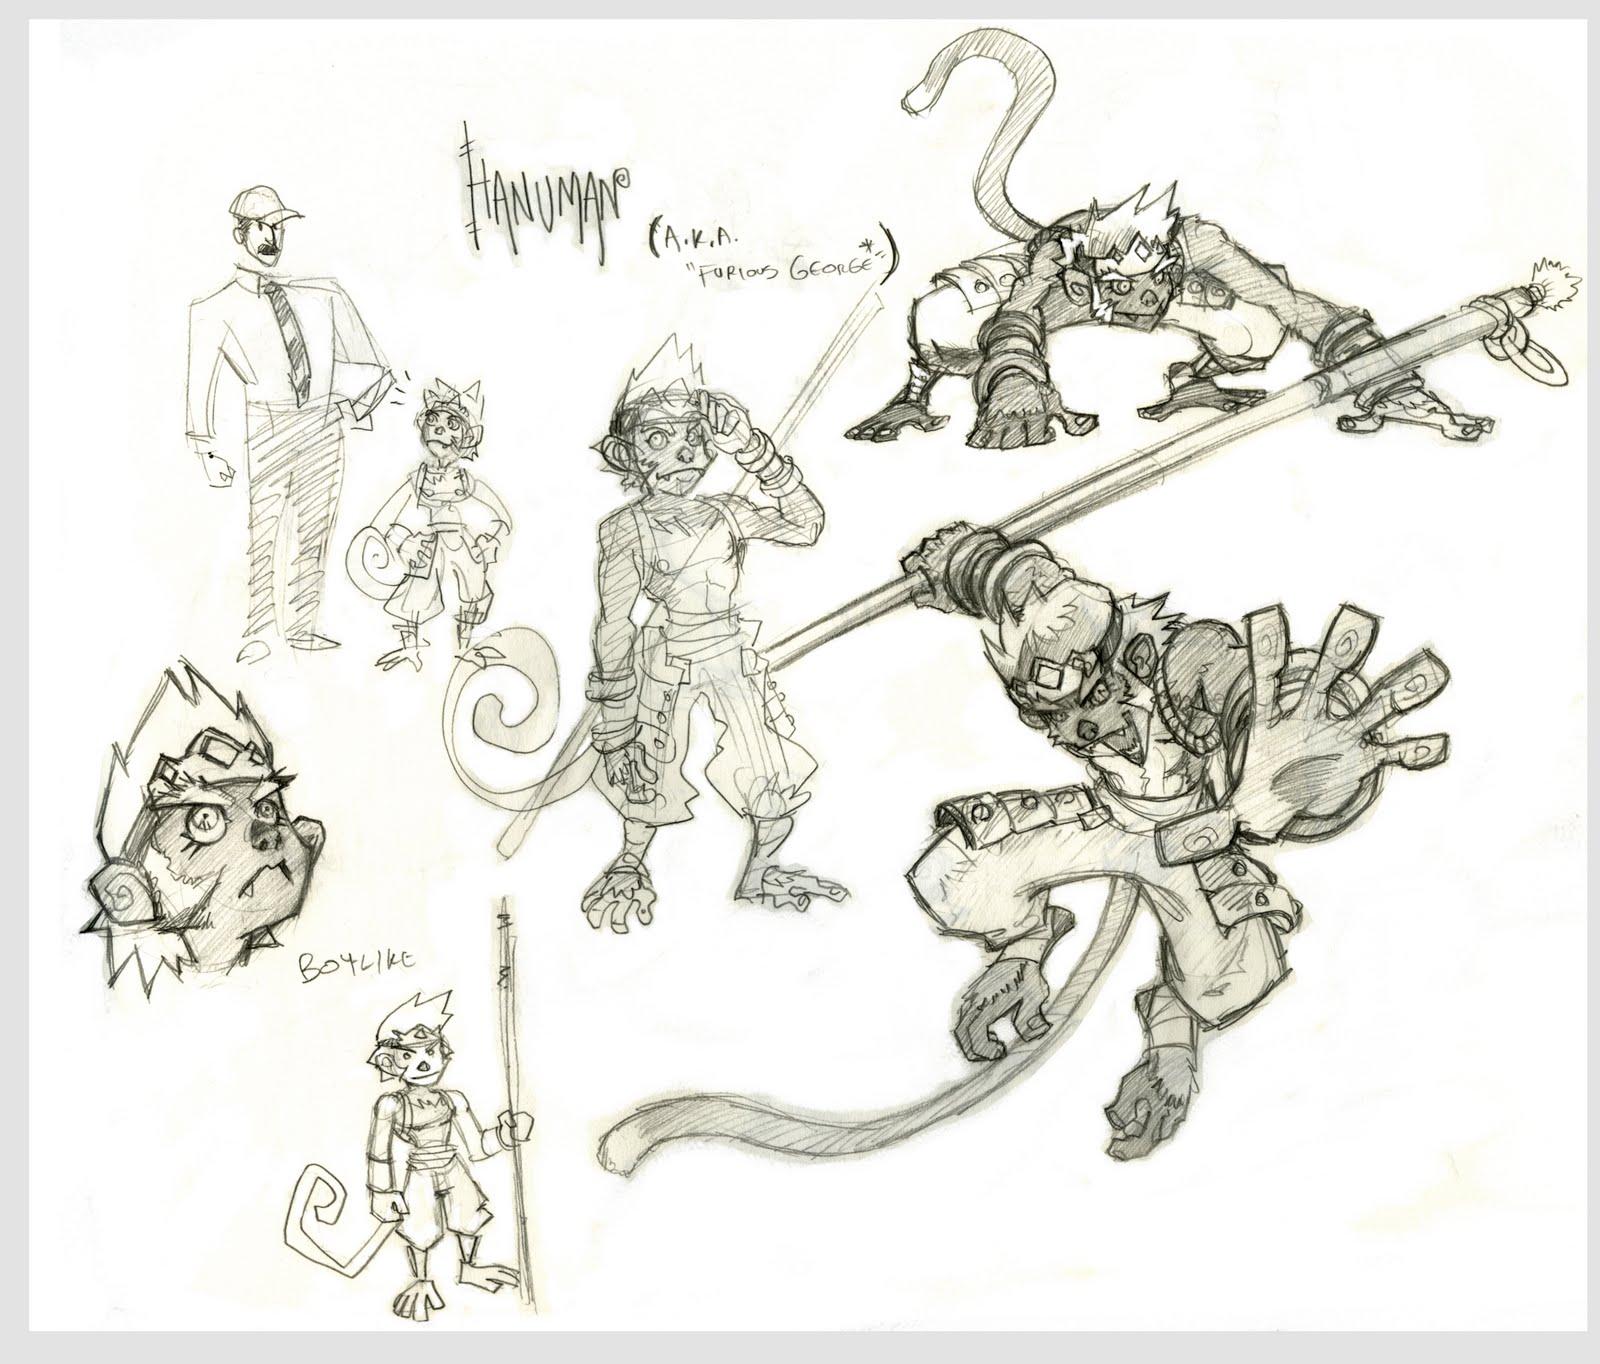 Character Design Hanuman : Morgan s art sun wukong hanuman design process